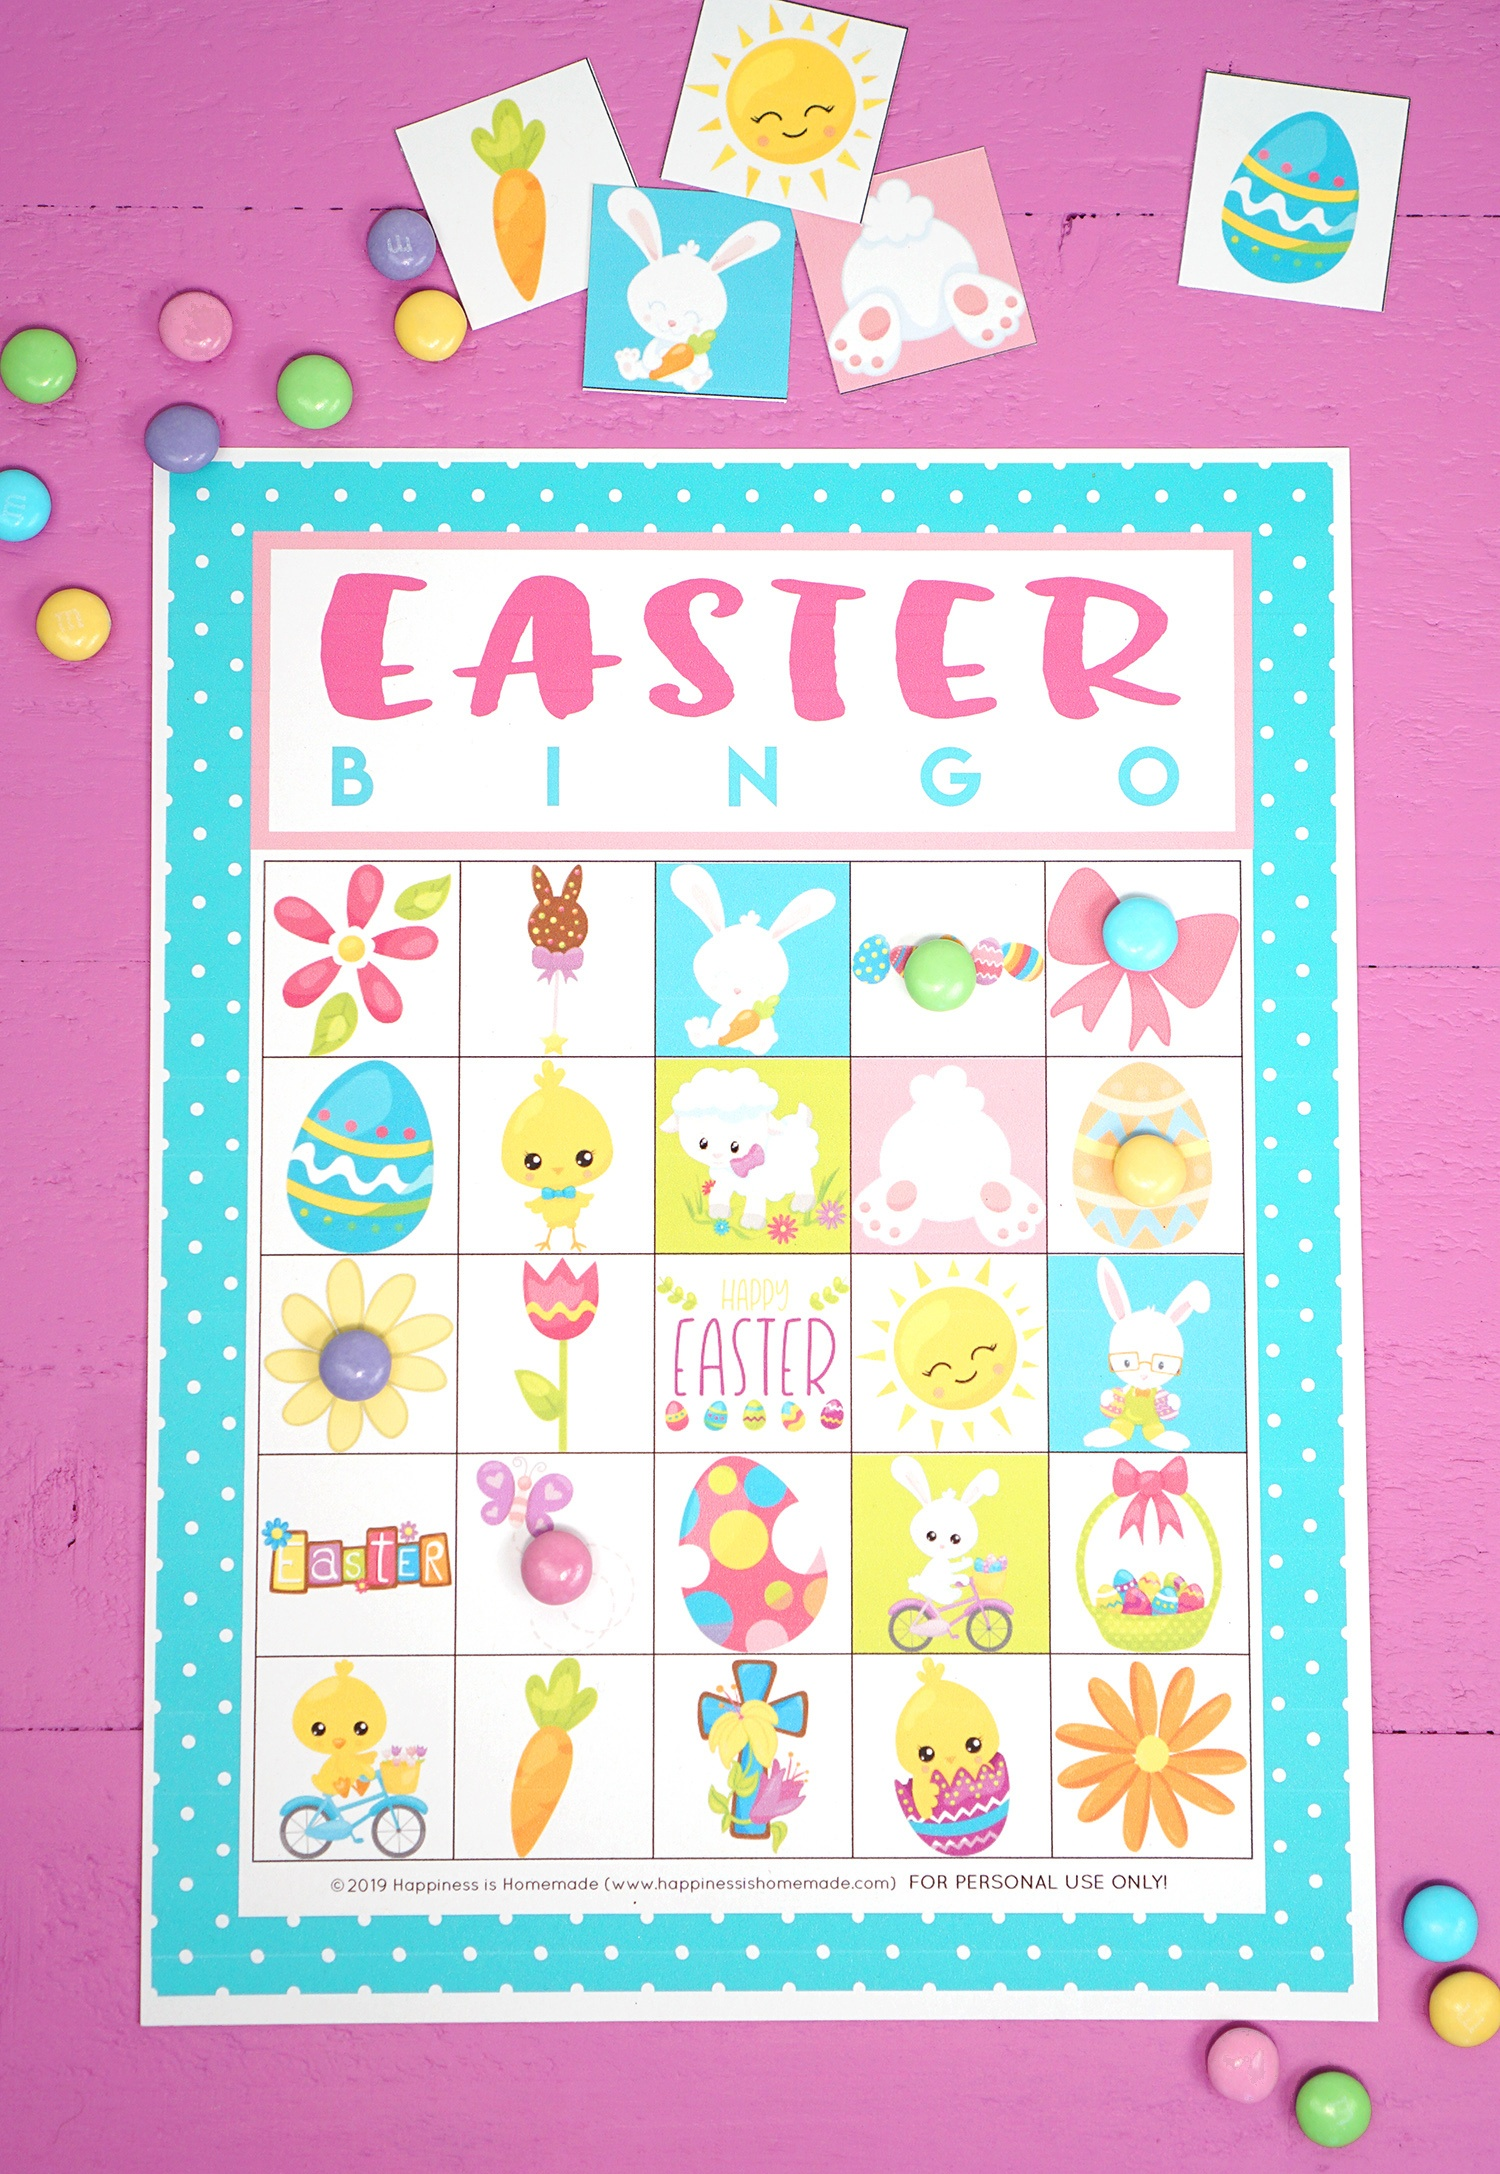 Free Printable Easter Bingo Game Cards - Happiness Is Homemade - Free Printable Bingo